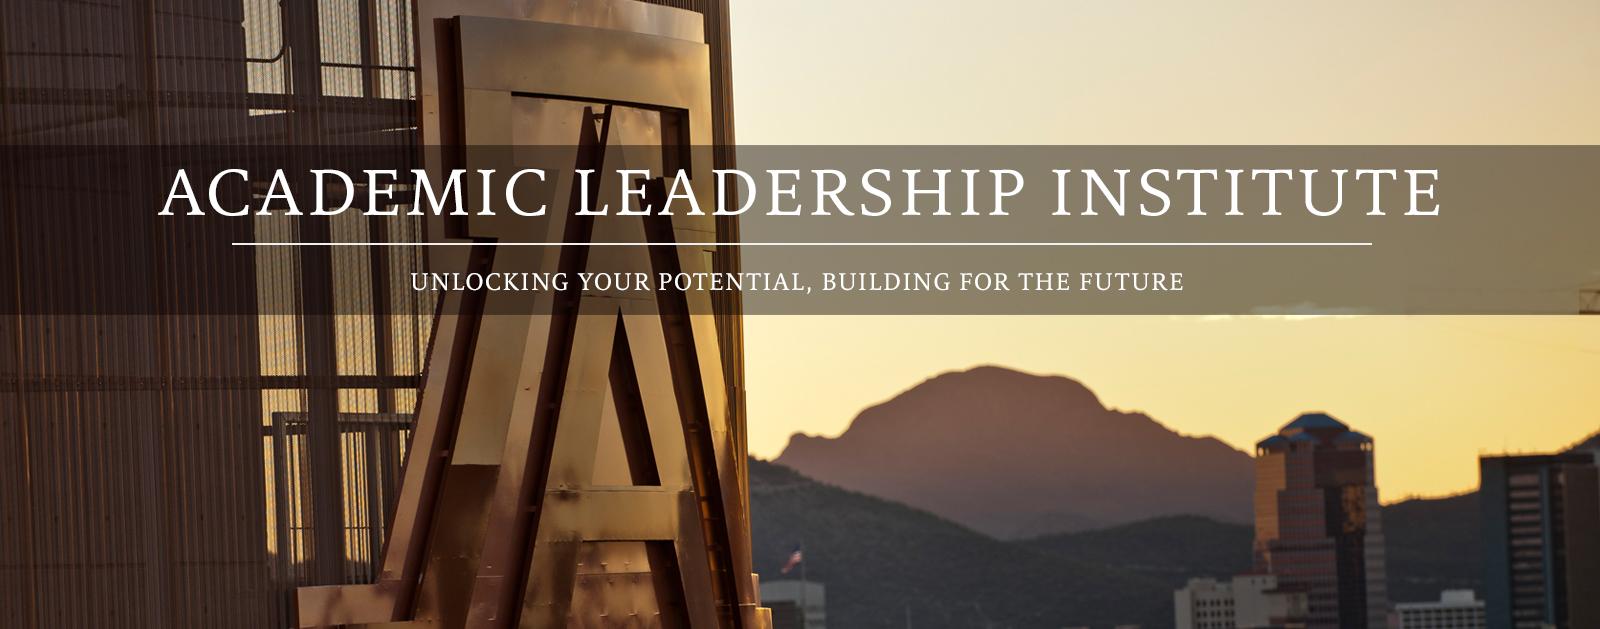 Academic Leadership Institute banner